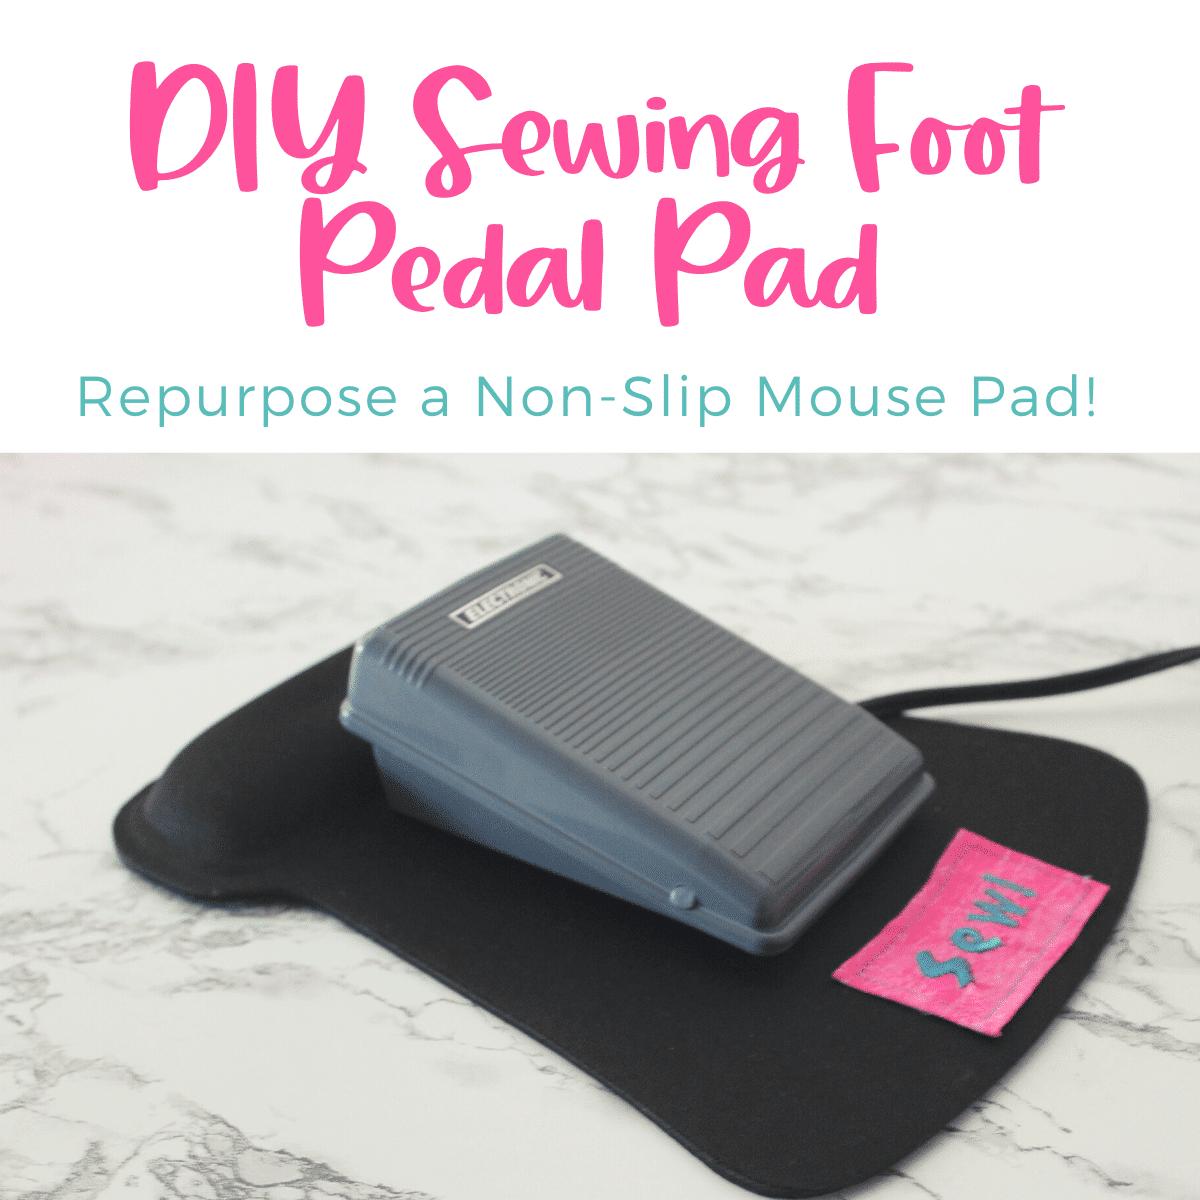 DIY Sewing Machine Foot Pedal Mat – Non-Slip!